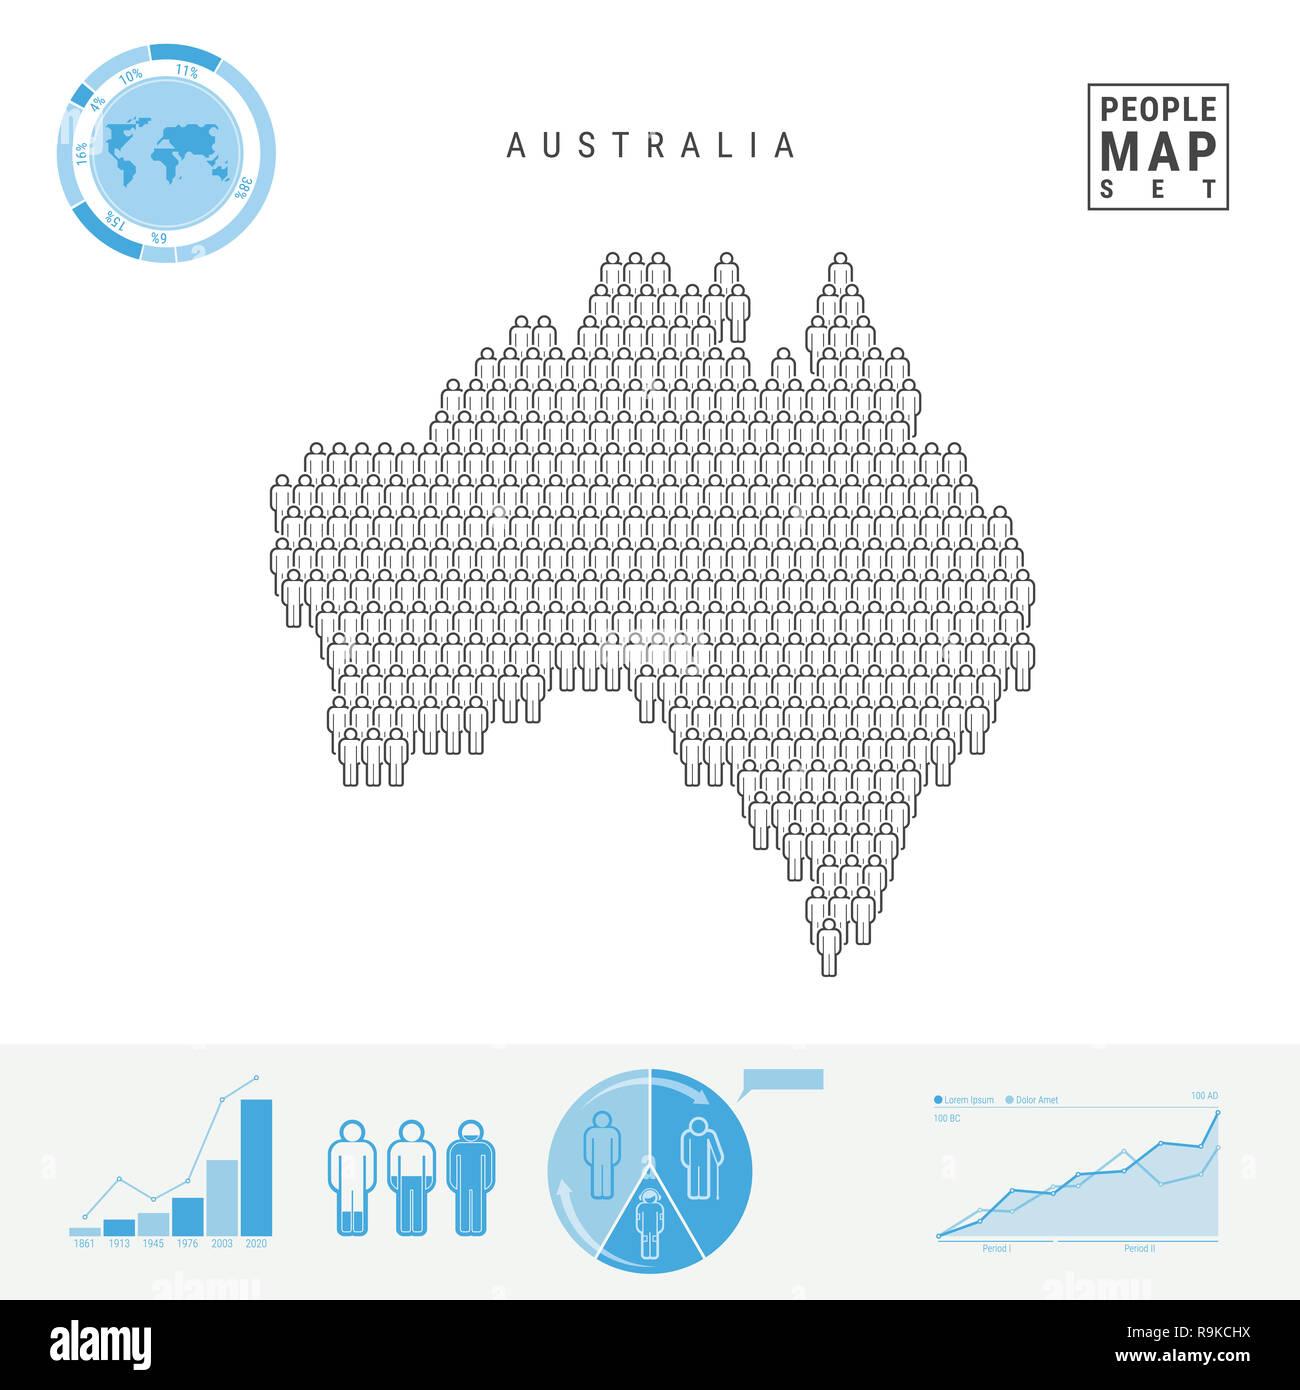 Australia Map Shape.Australia People Icon Map People Crowd In The Shape Of Australia